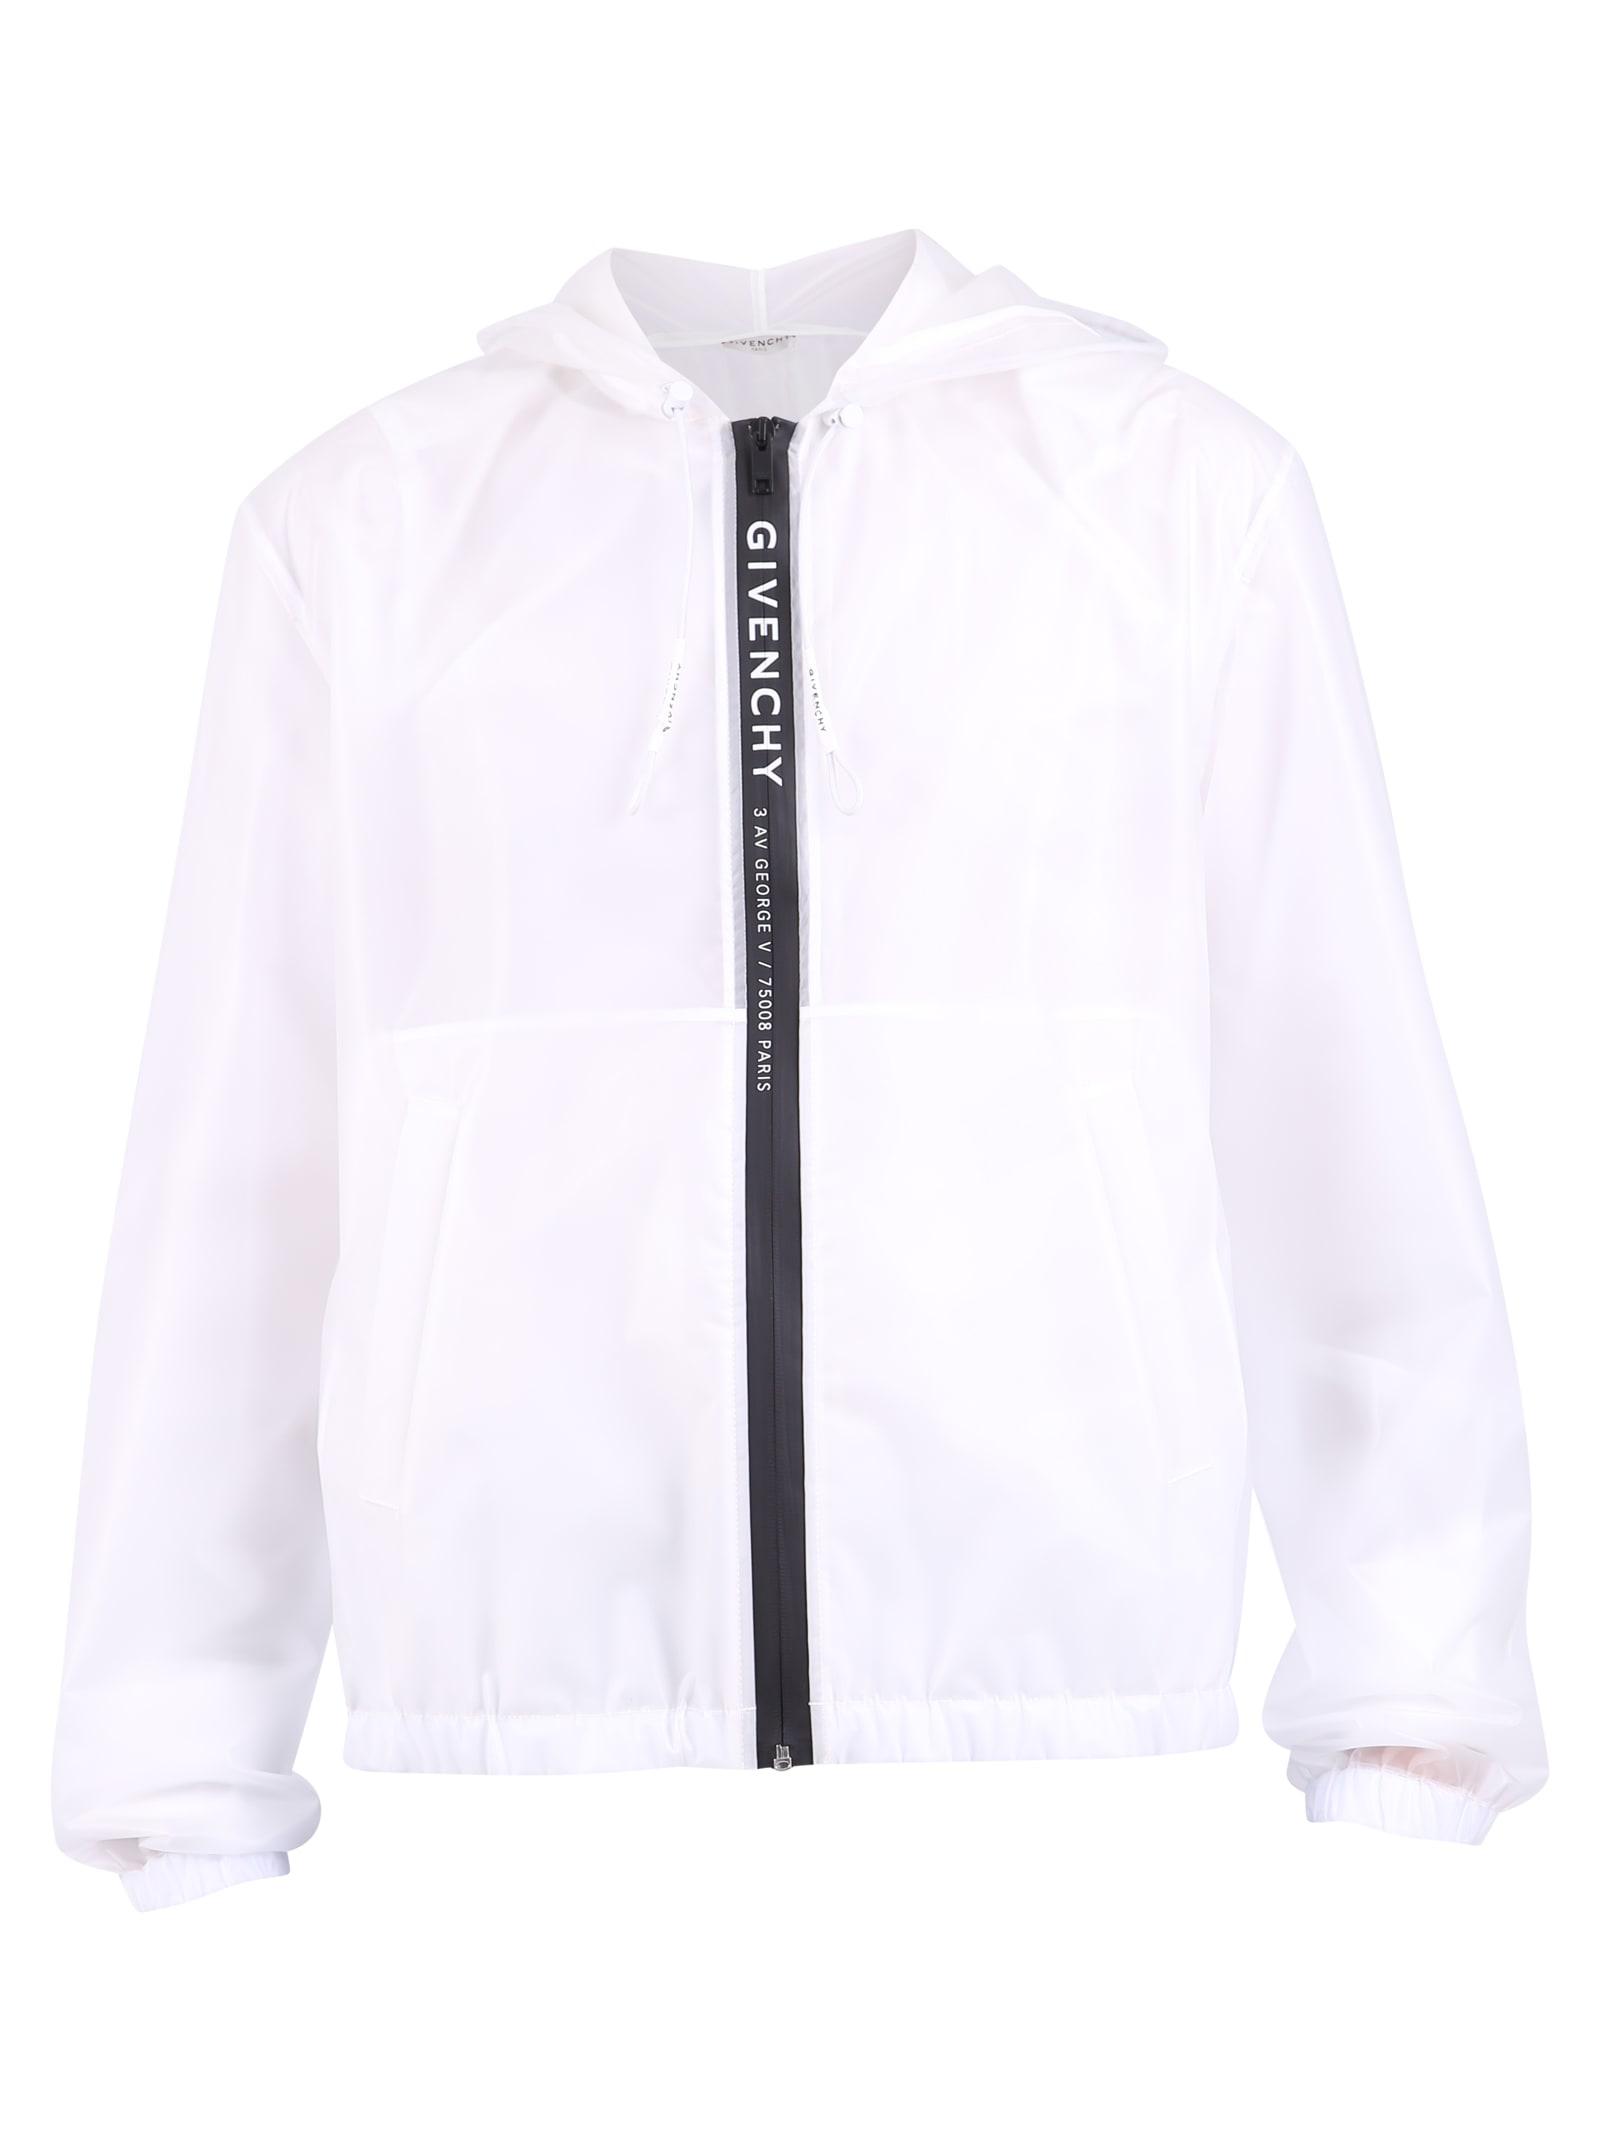 Givenchy Branded Jacket